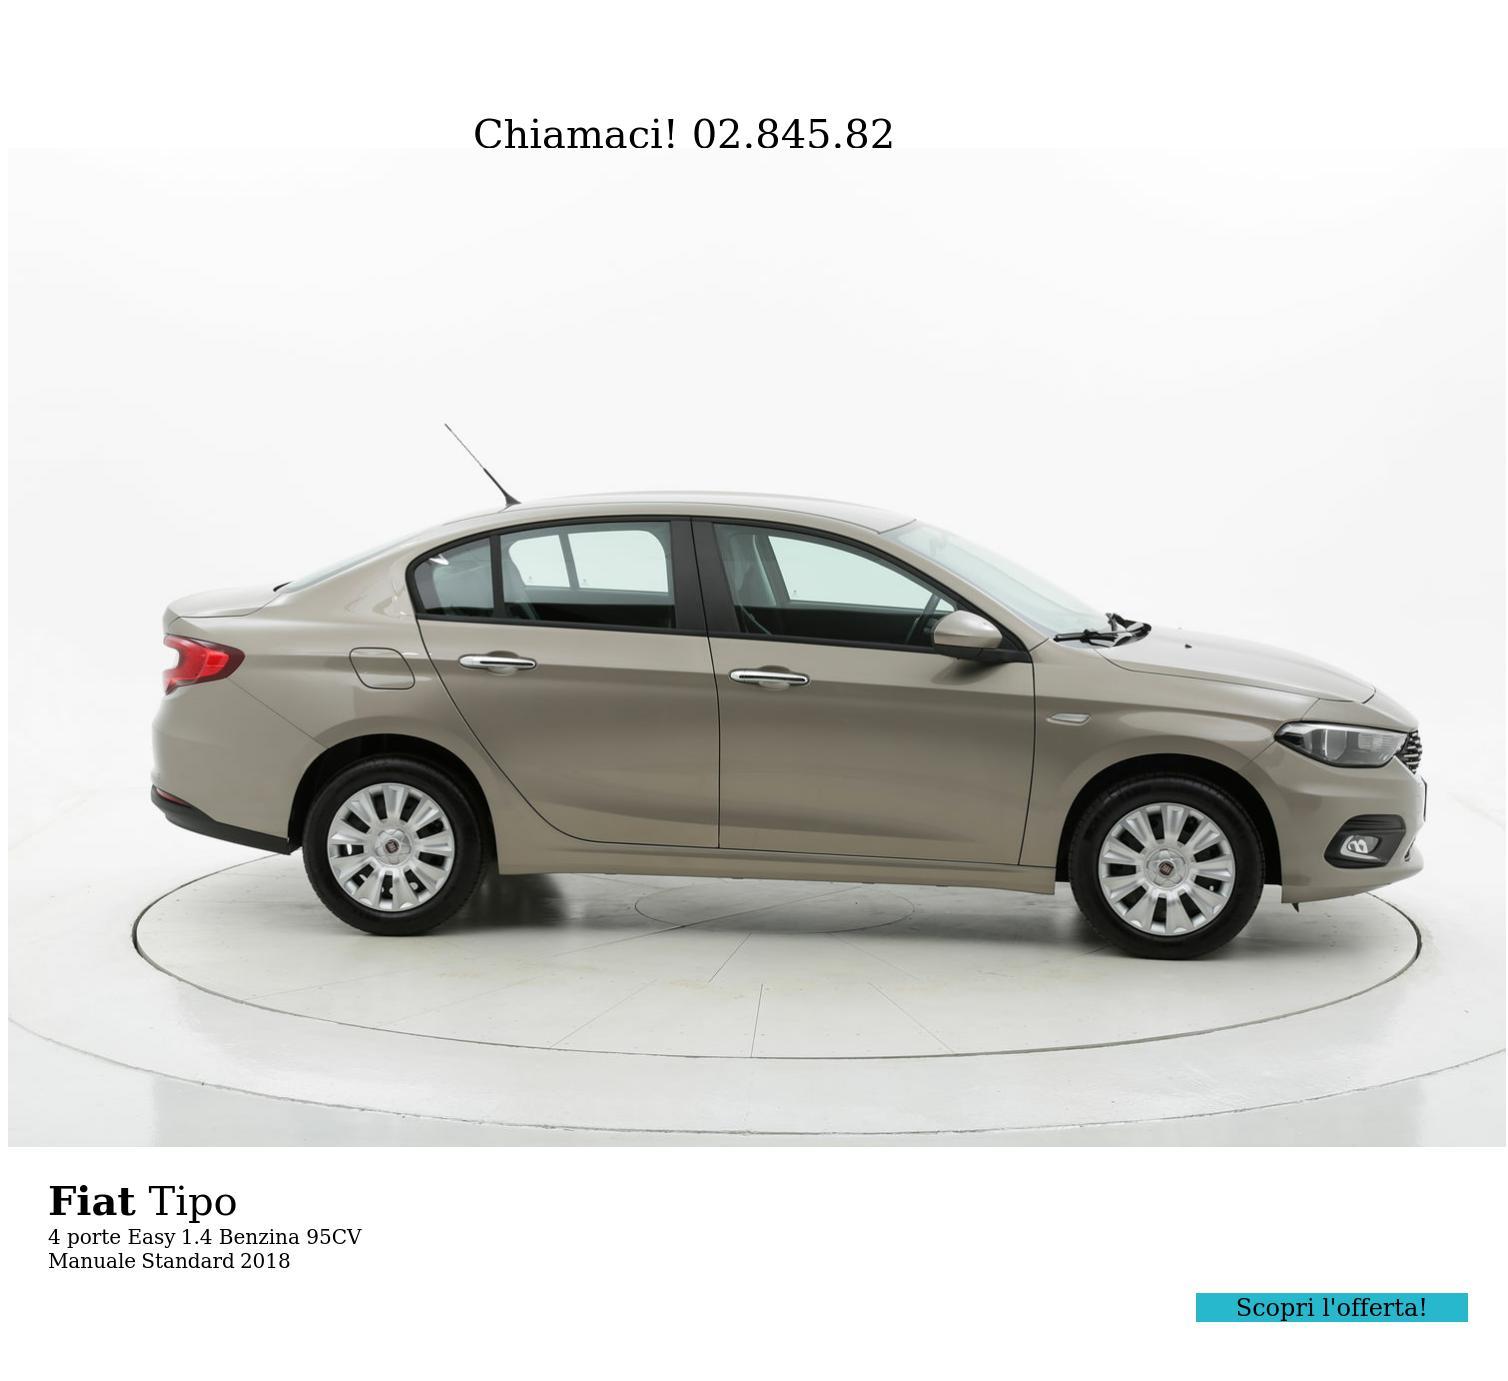 Fiat Tipo 4 porte Easy km 0 benzina beige | brumbrum